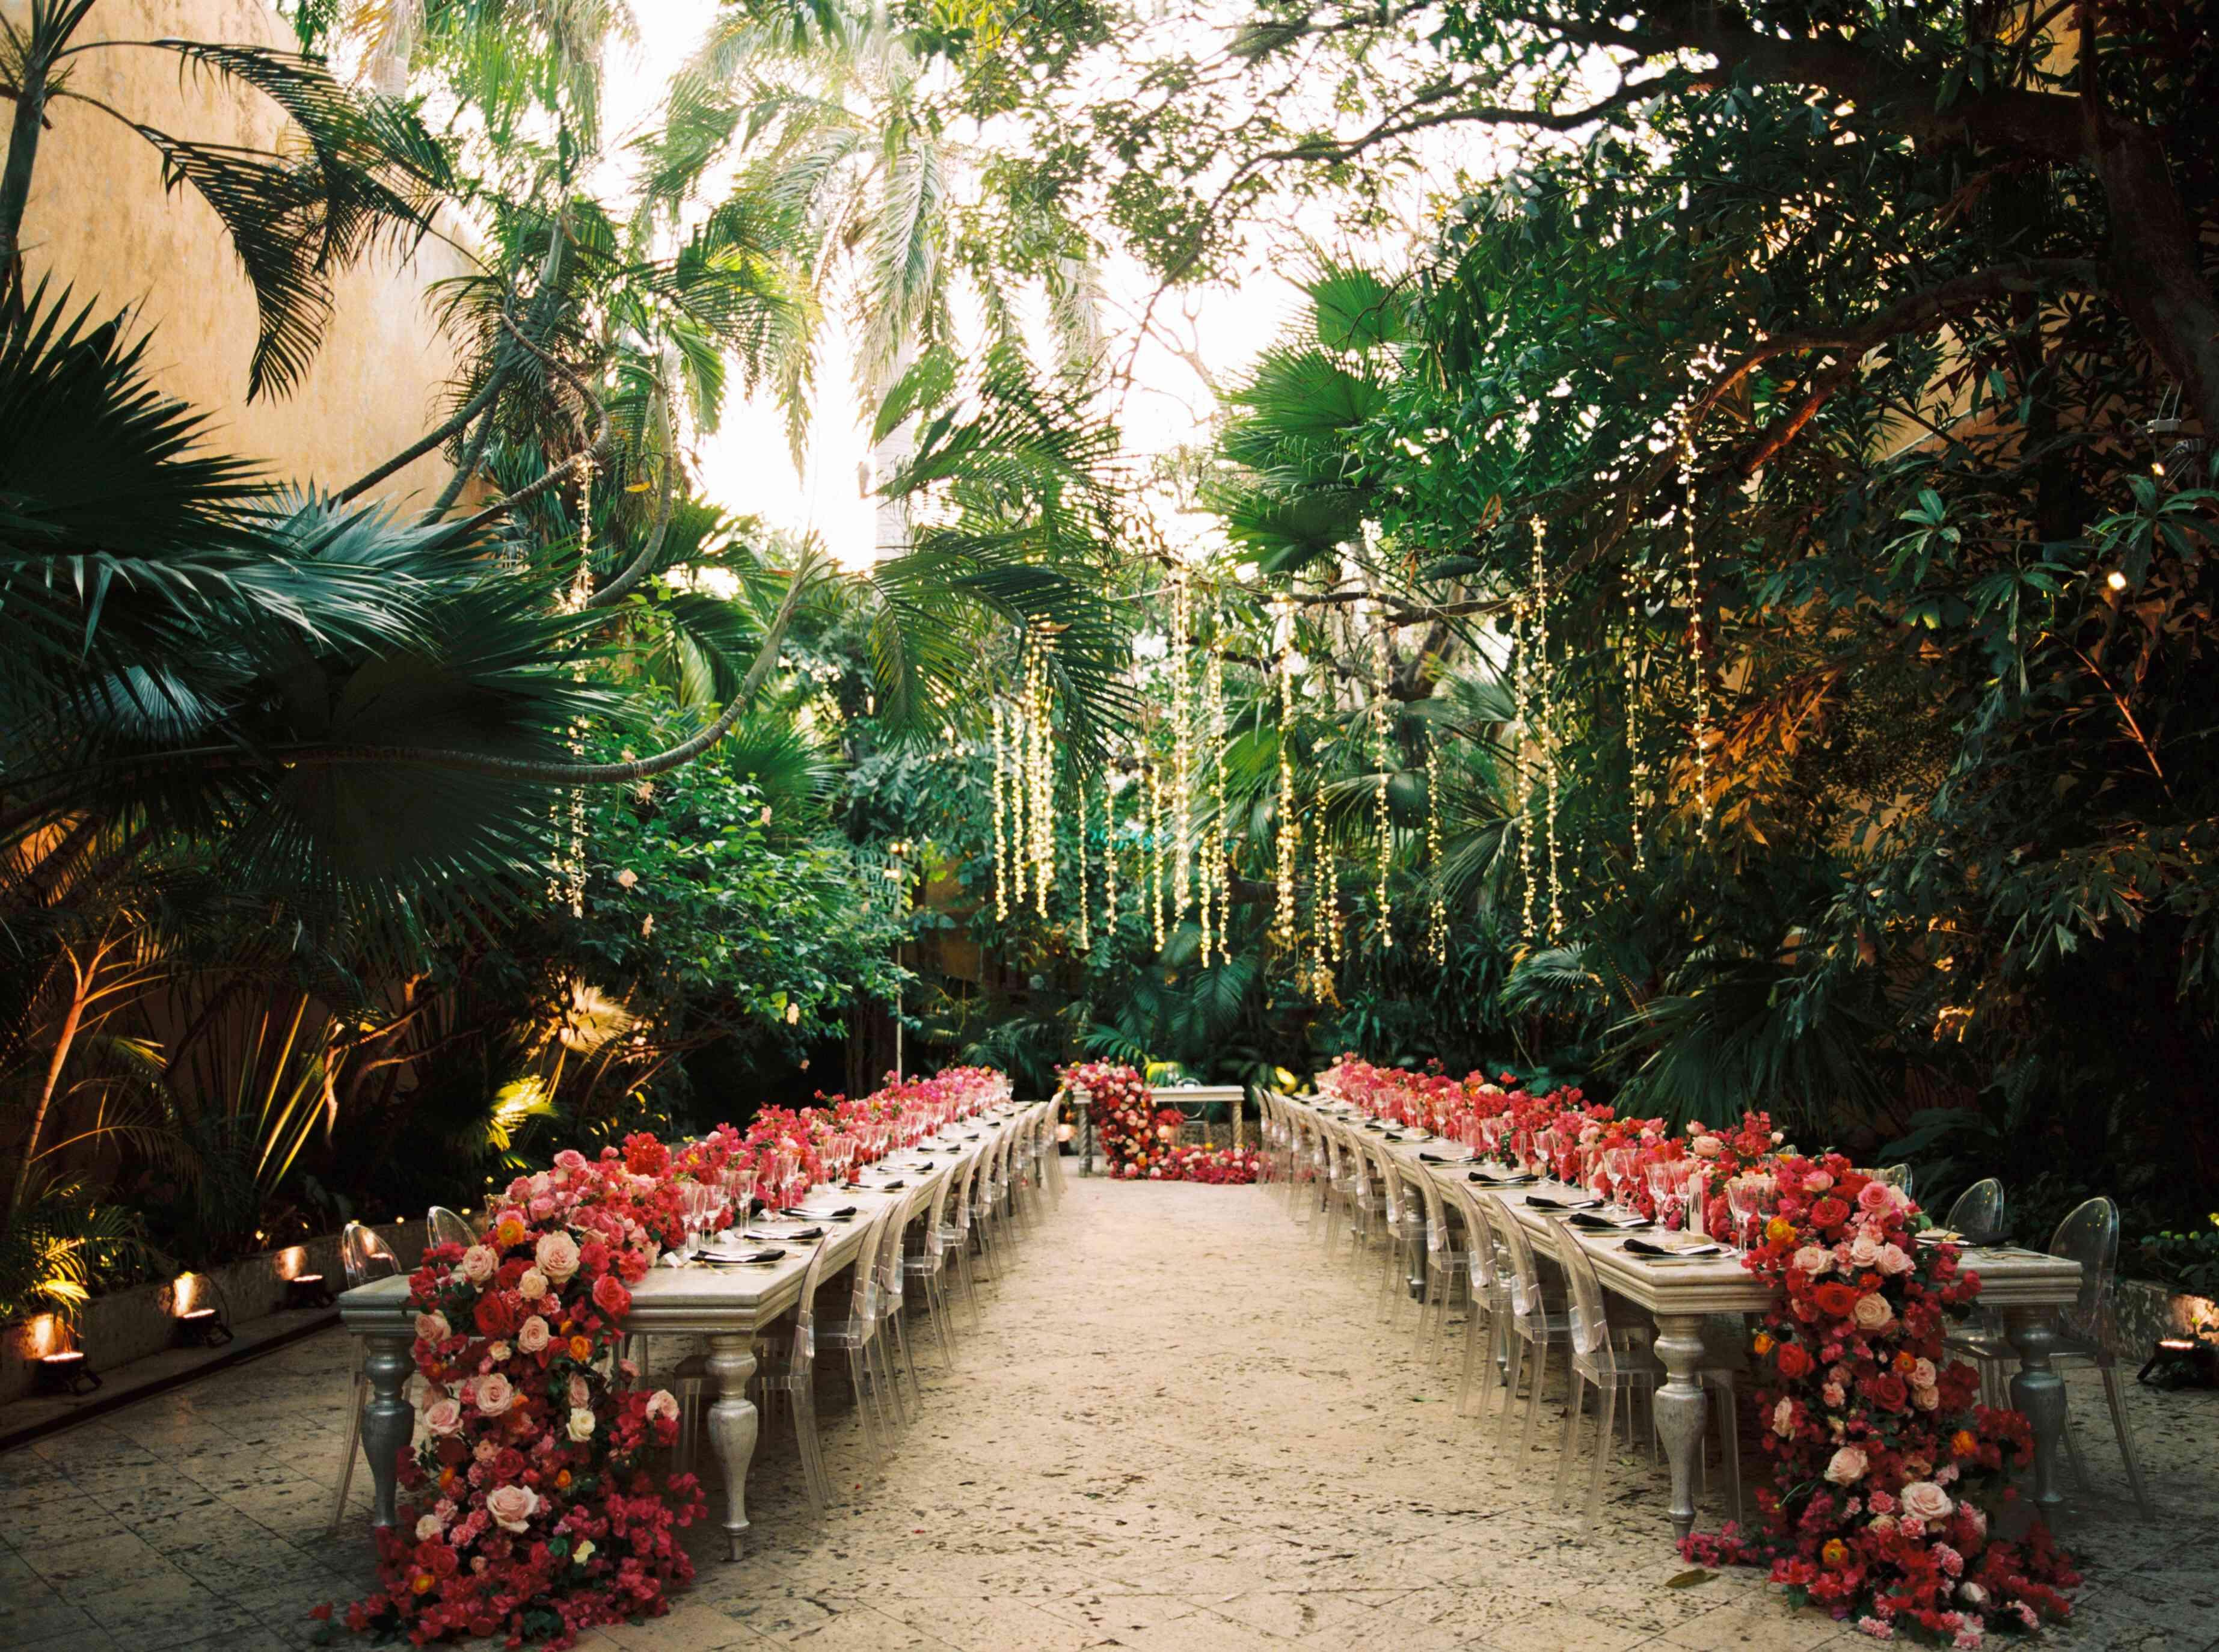 Bougainvillea table runners in verdant jungle setting